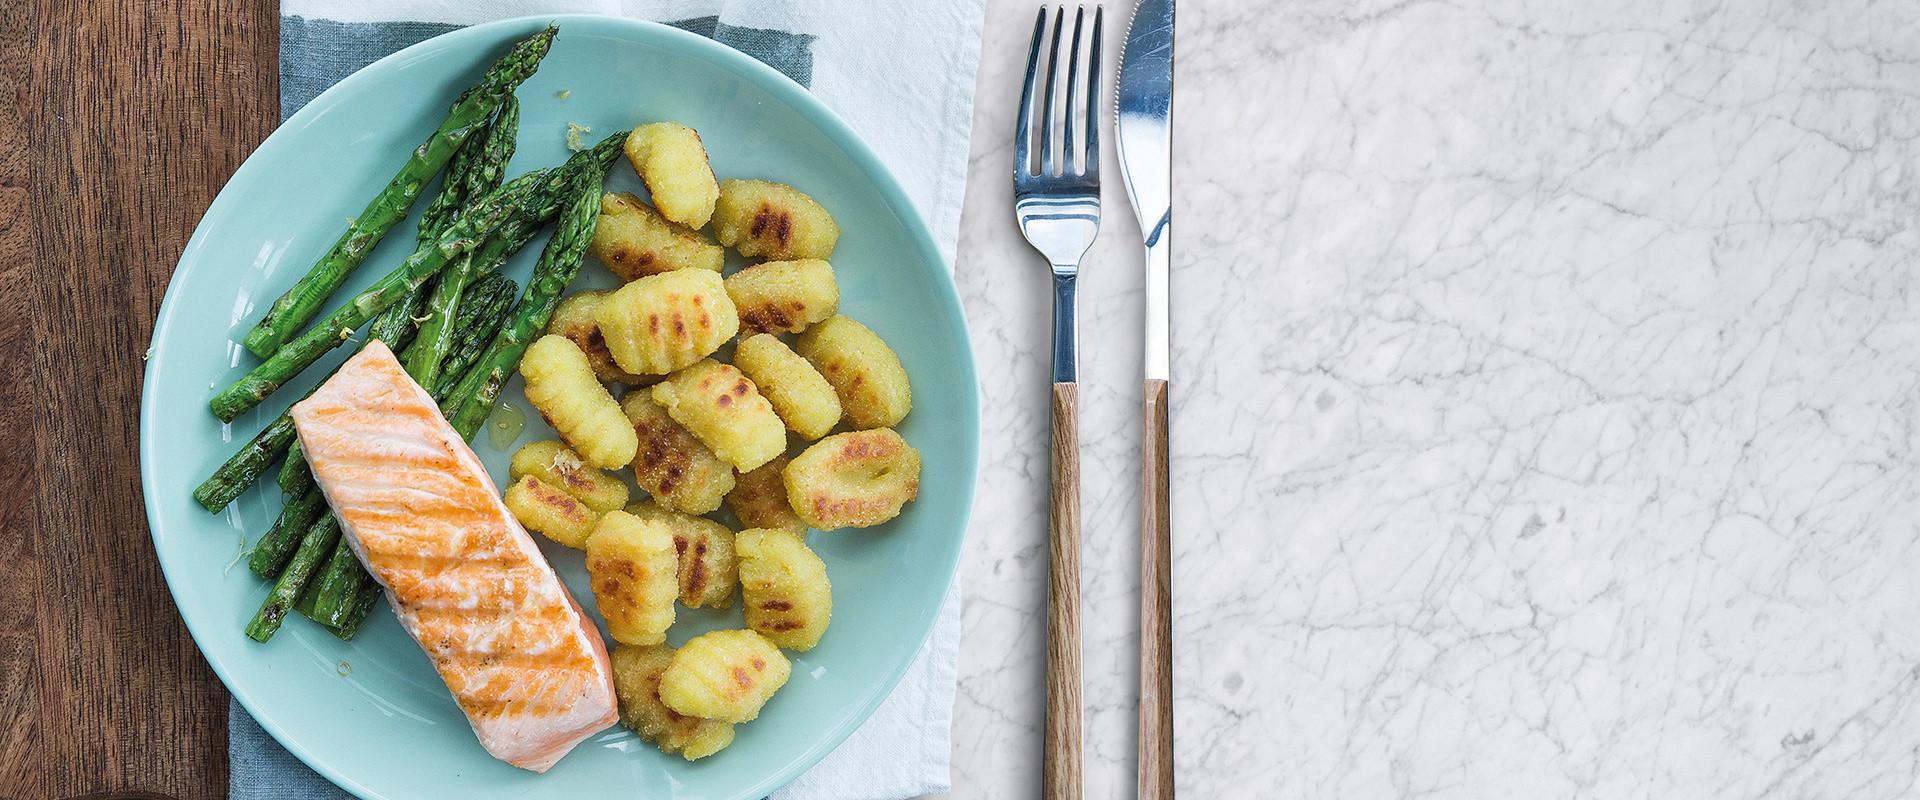 Salmon Filet With Asparagus And Original Pan Fried Gnocchi